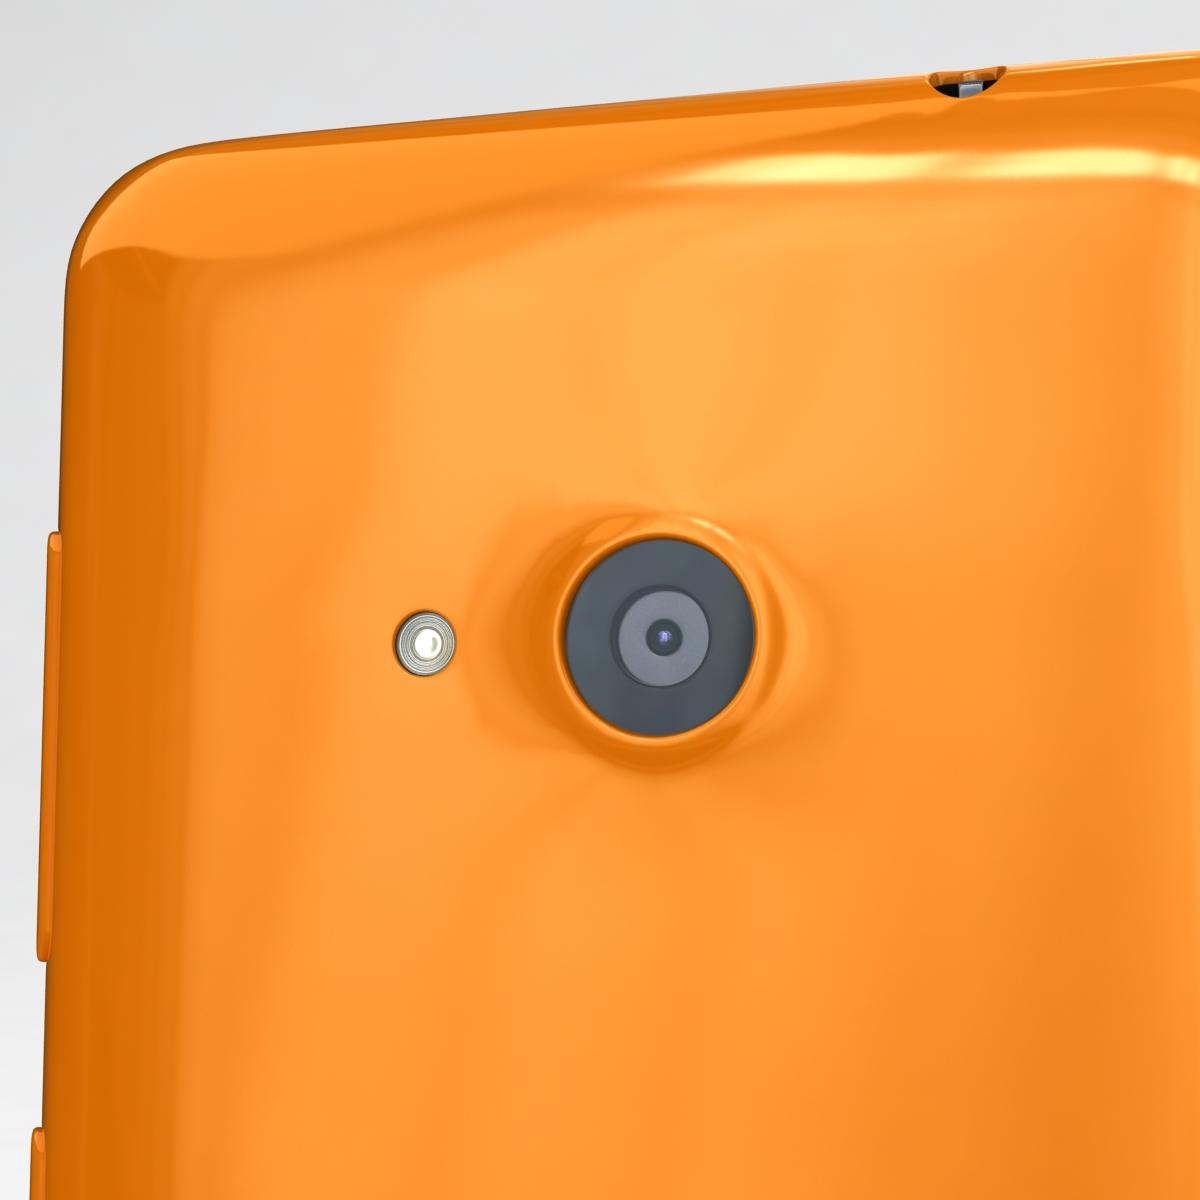 microsoft lumia 535 and dual sim orange 3d model 3ds max fbx c4d obj 204117